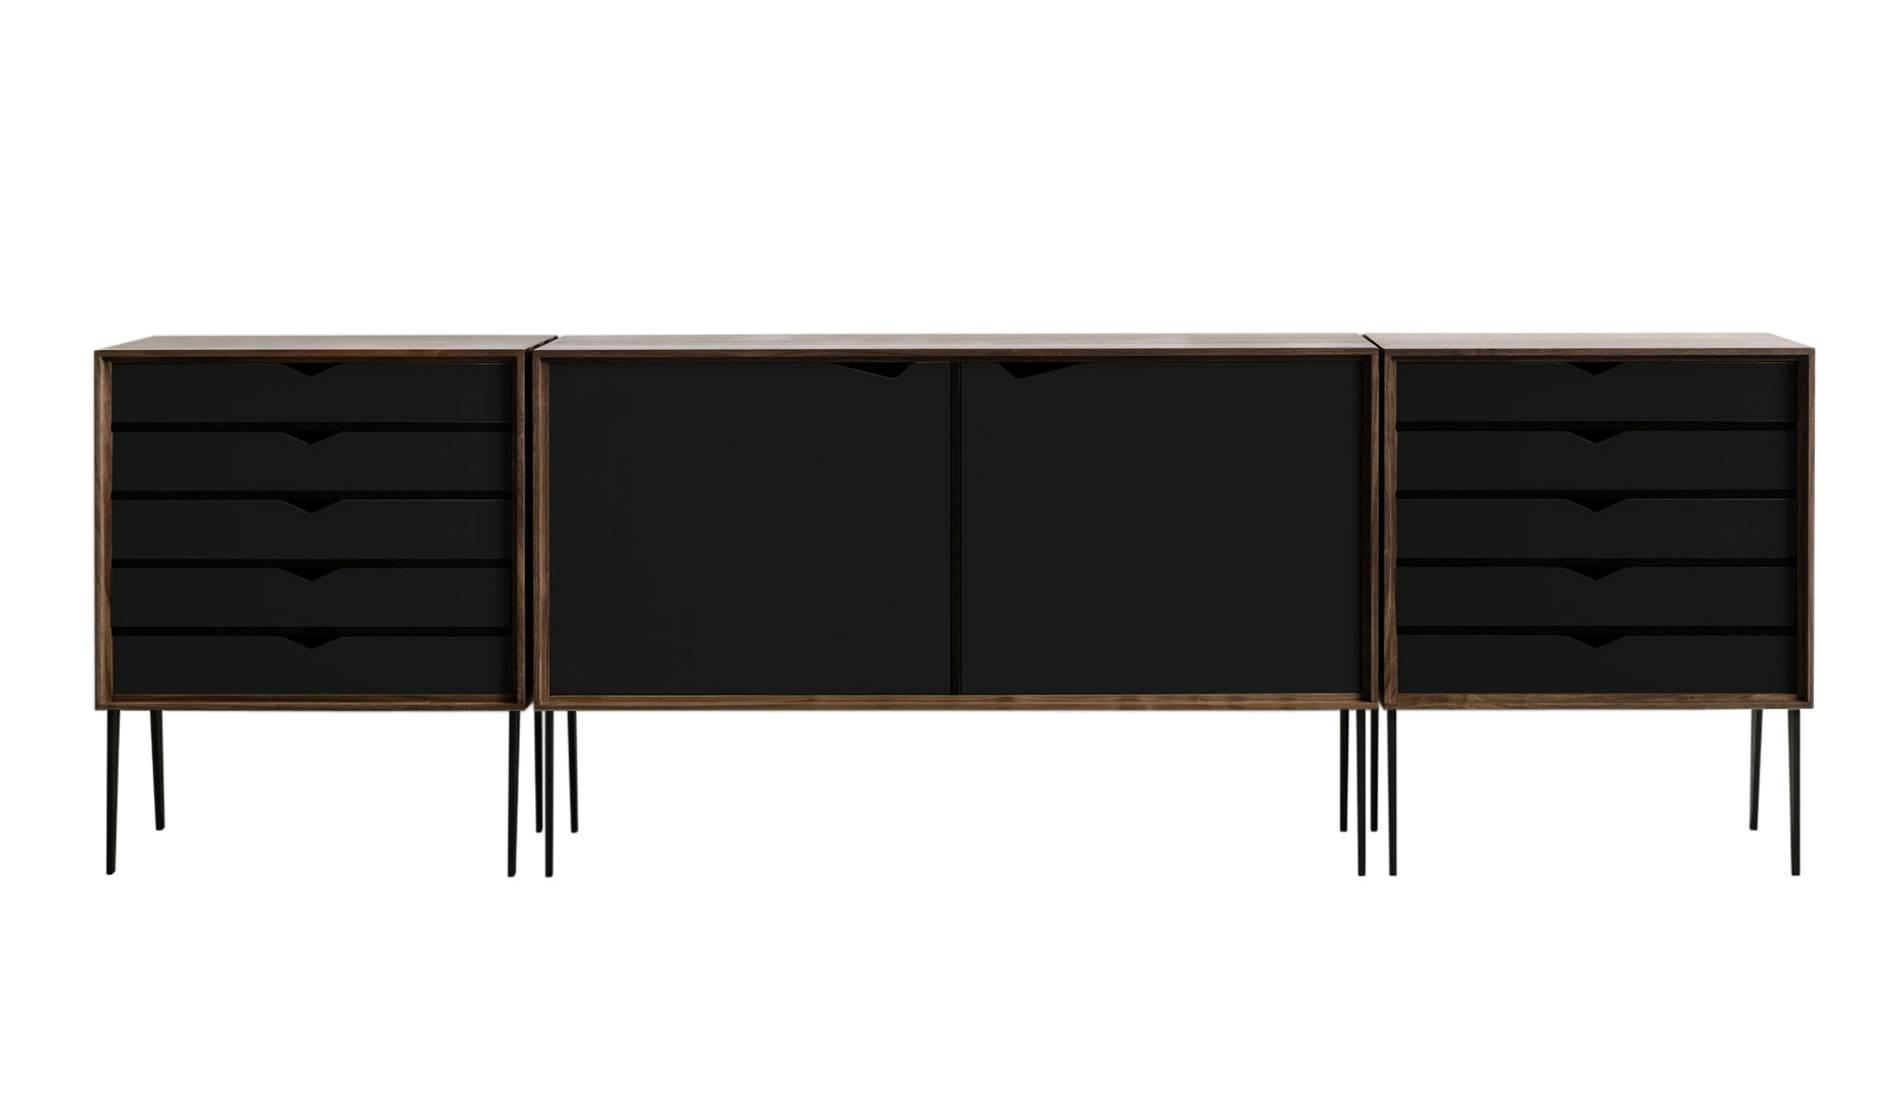 Andersen S2 Walnut / Black Sideboard | Dopo Domani Regarding Black And Walnut Sideboards (#3 of 15)